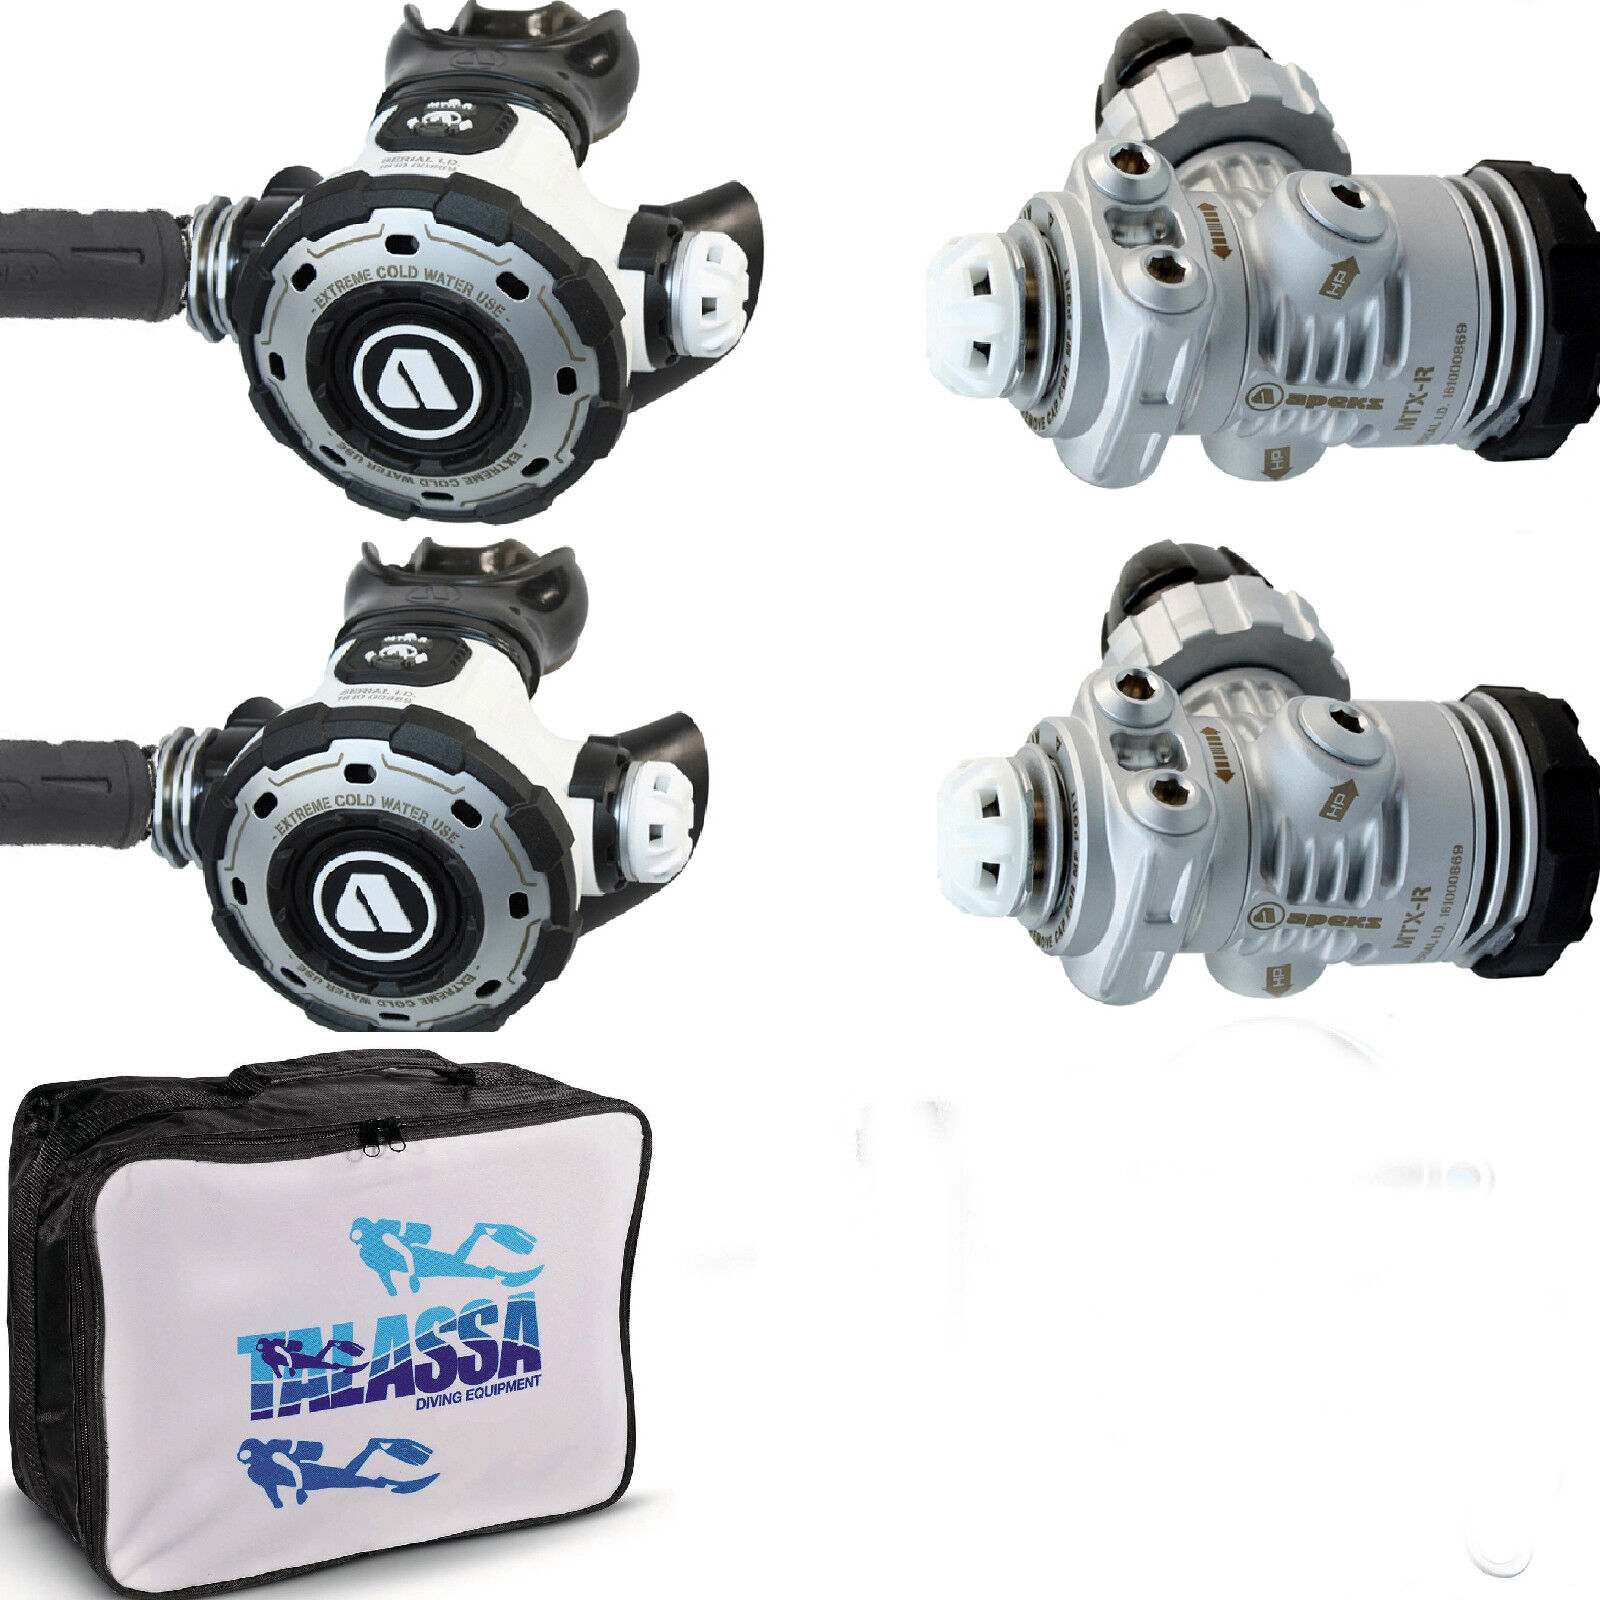 LO3 DIR kit regulators  Apeks MTX-R + hoses